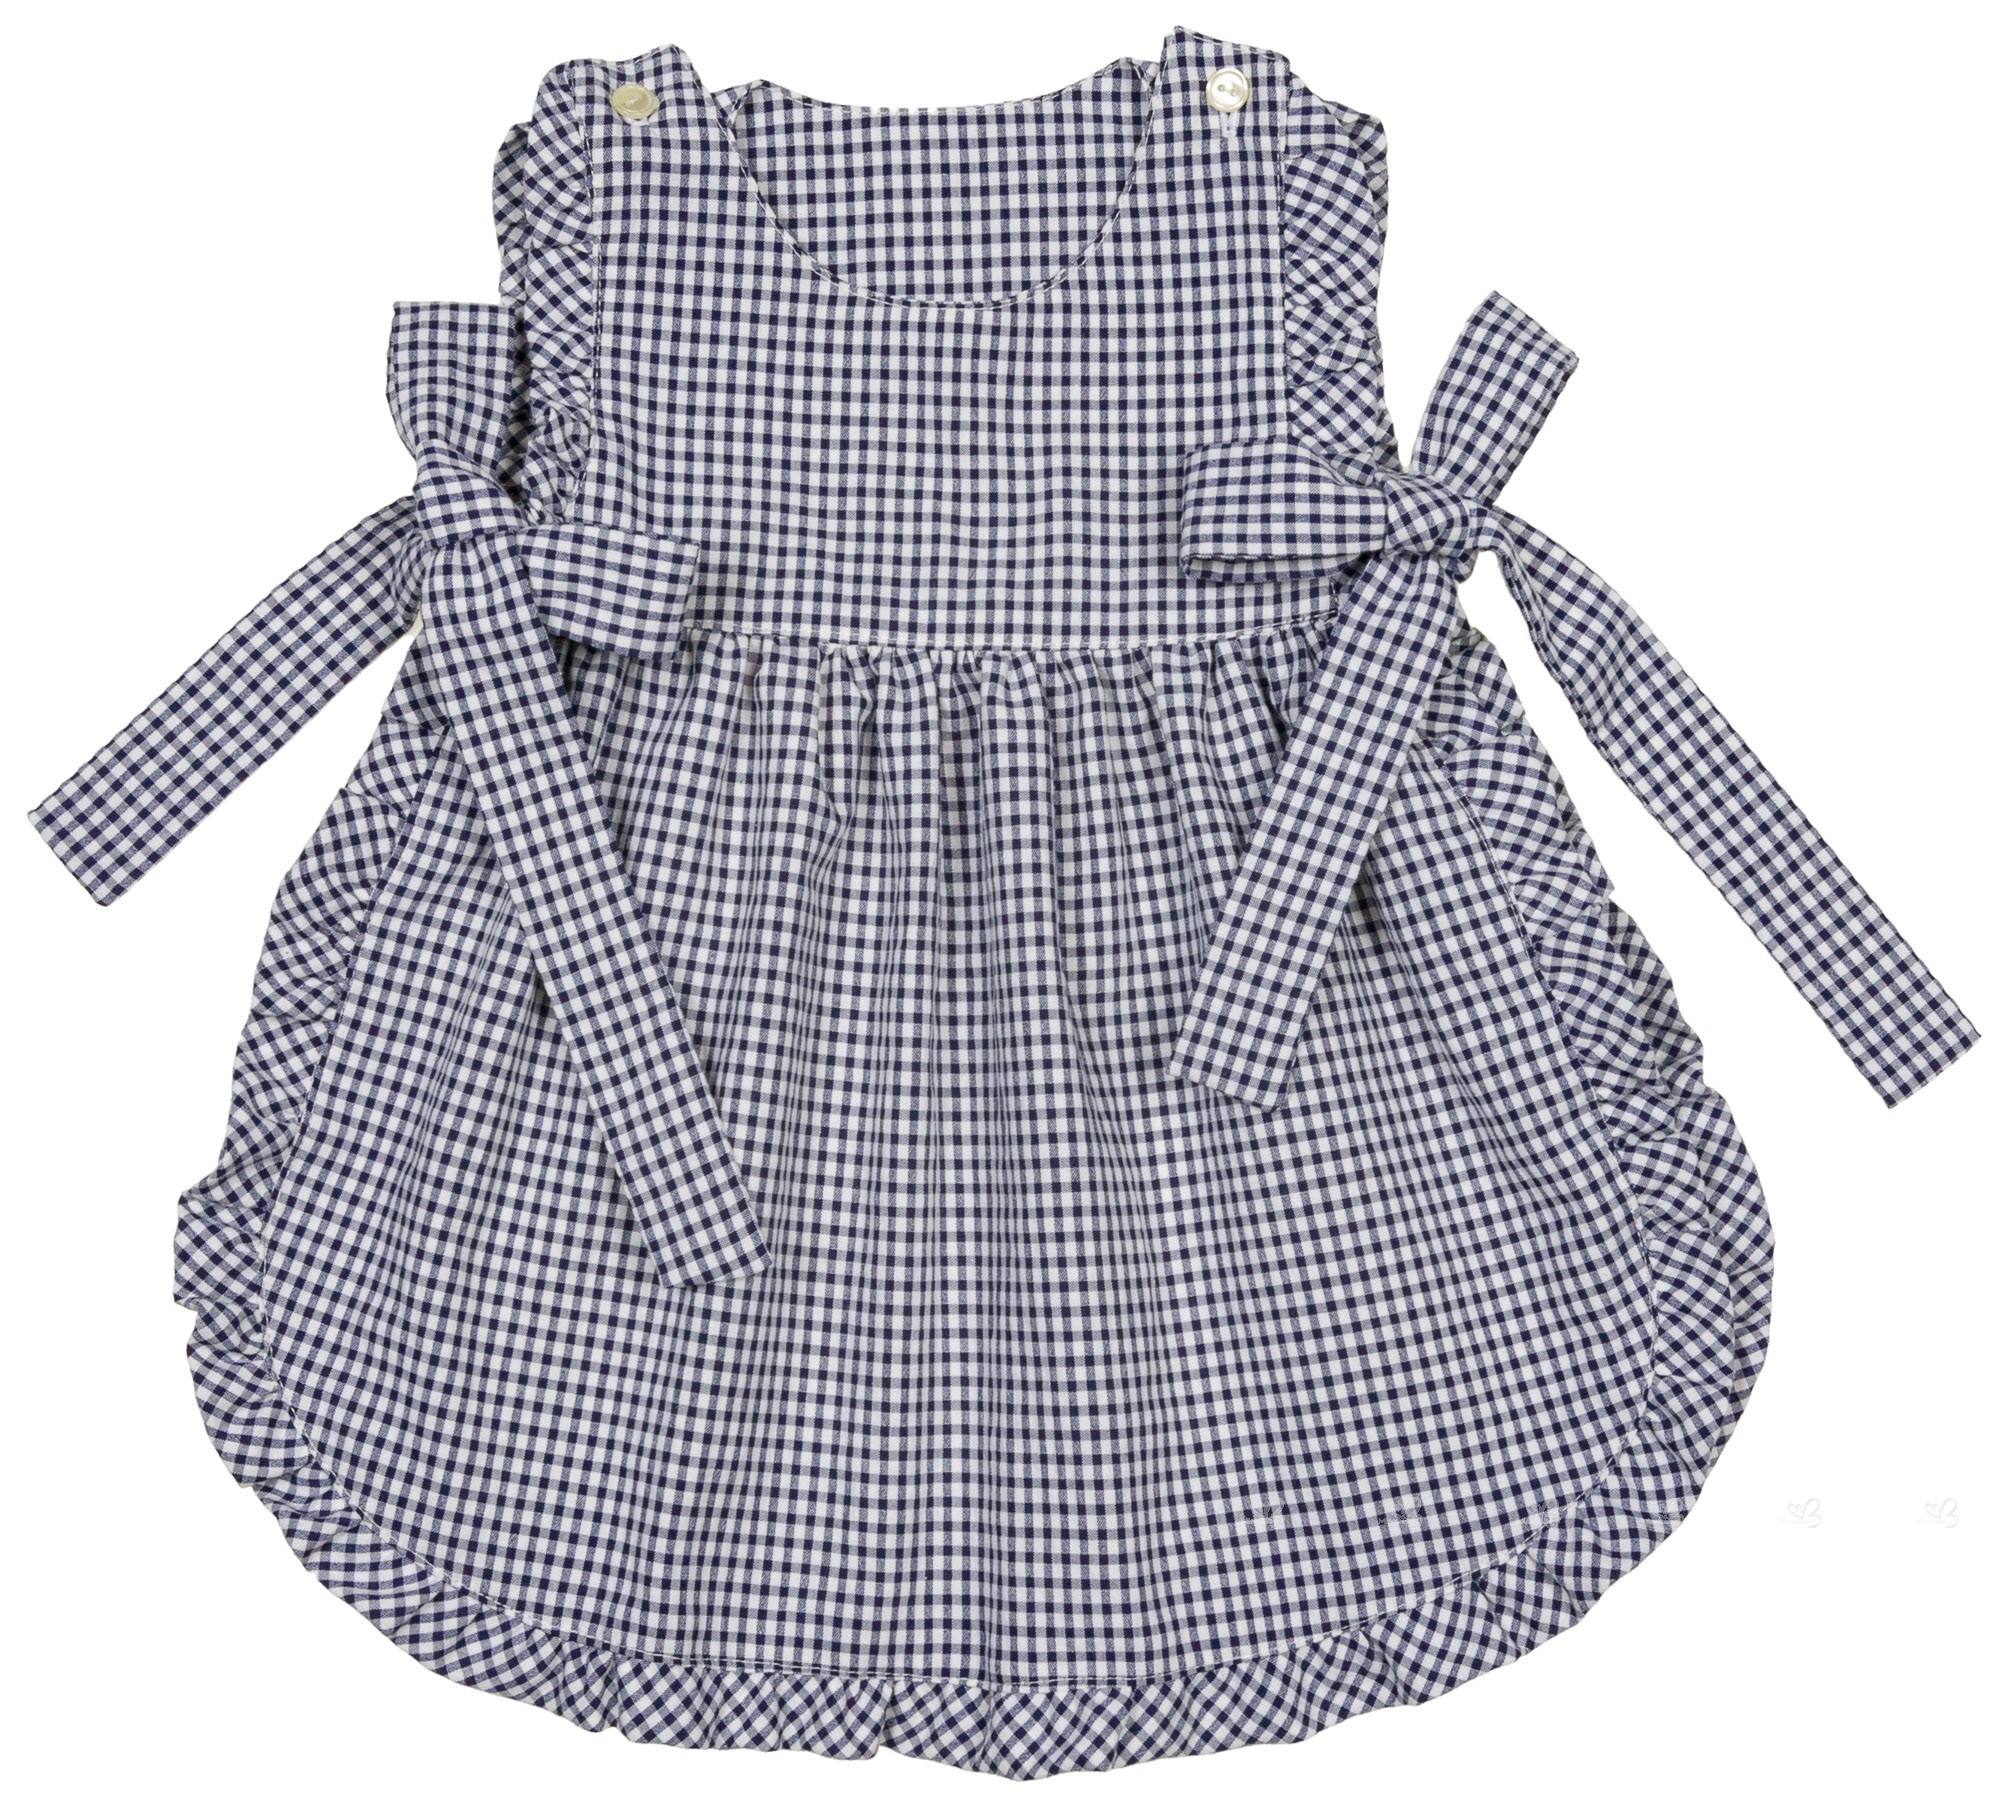 7f2b0163b Home; Baby Girls Blue & White Gingham Apron Dress Set. Carmencita Conjunto  Bebé Niña Mandil Braguita Vichy Marino ...